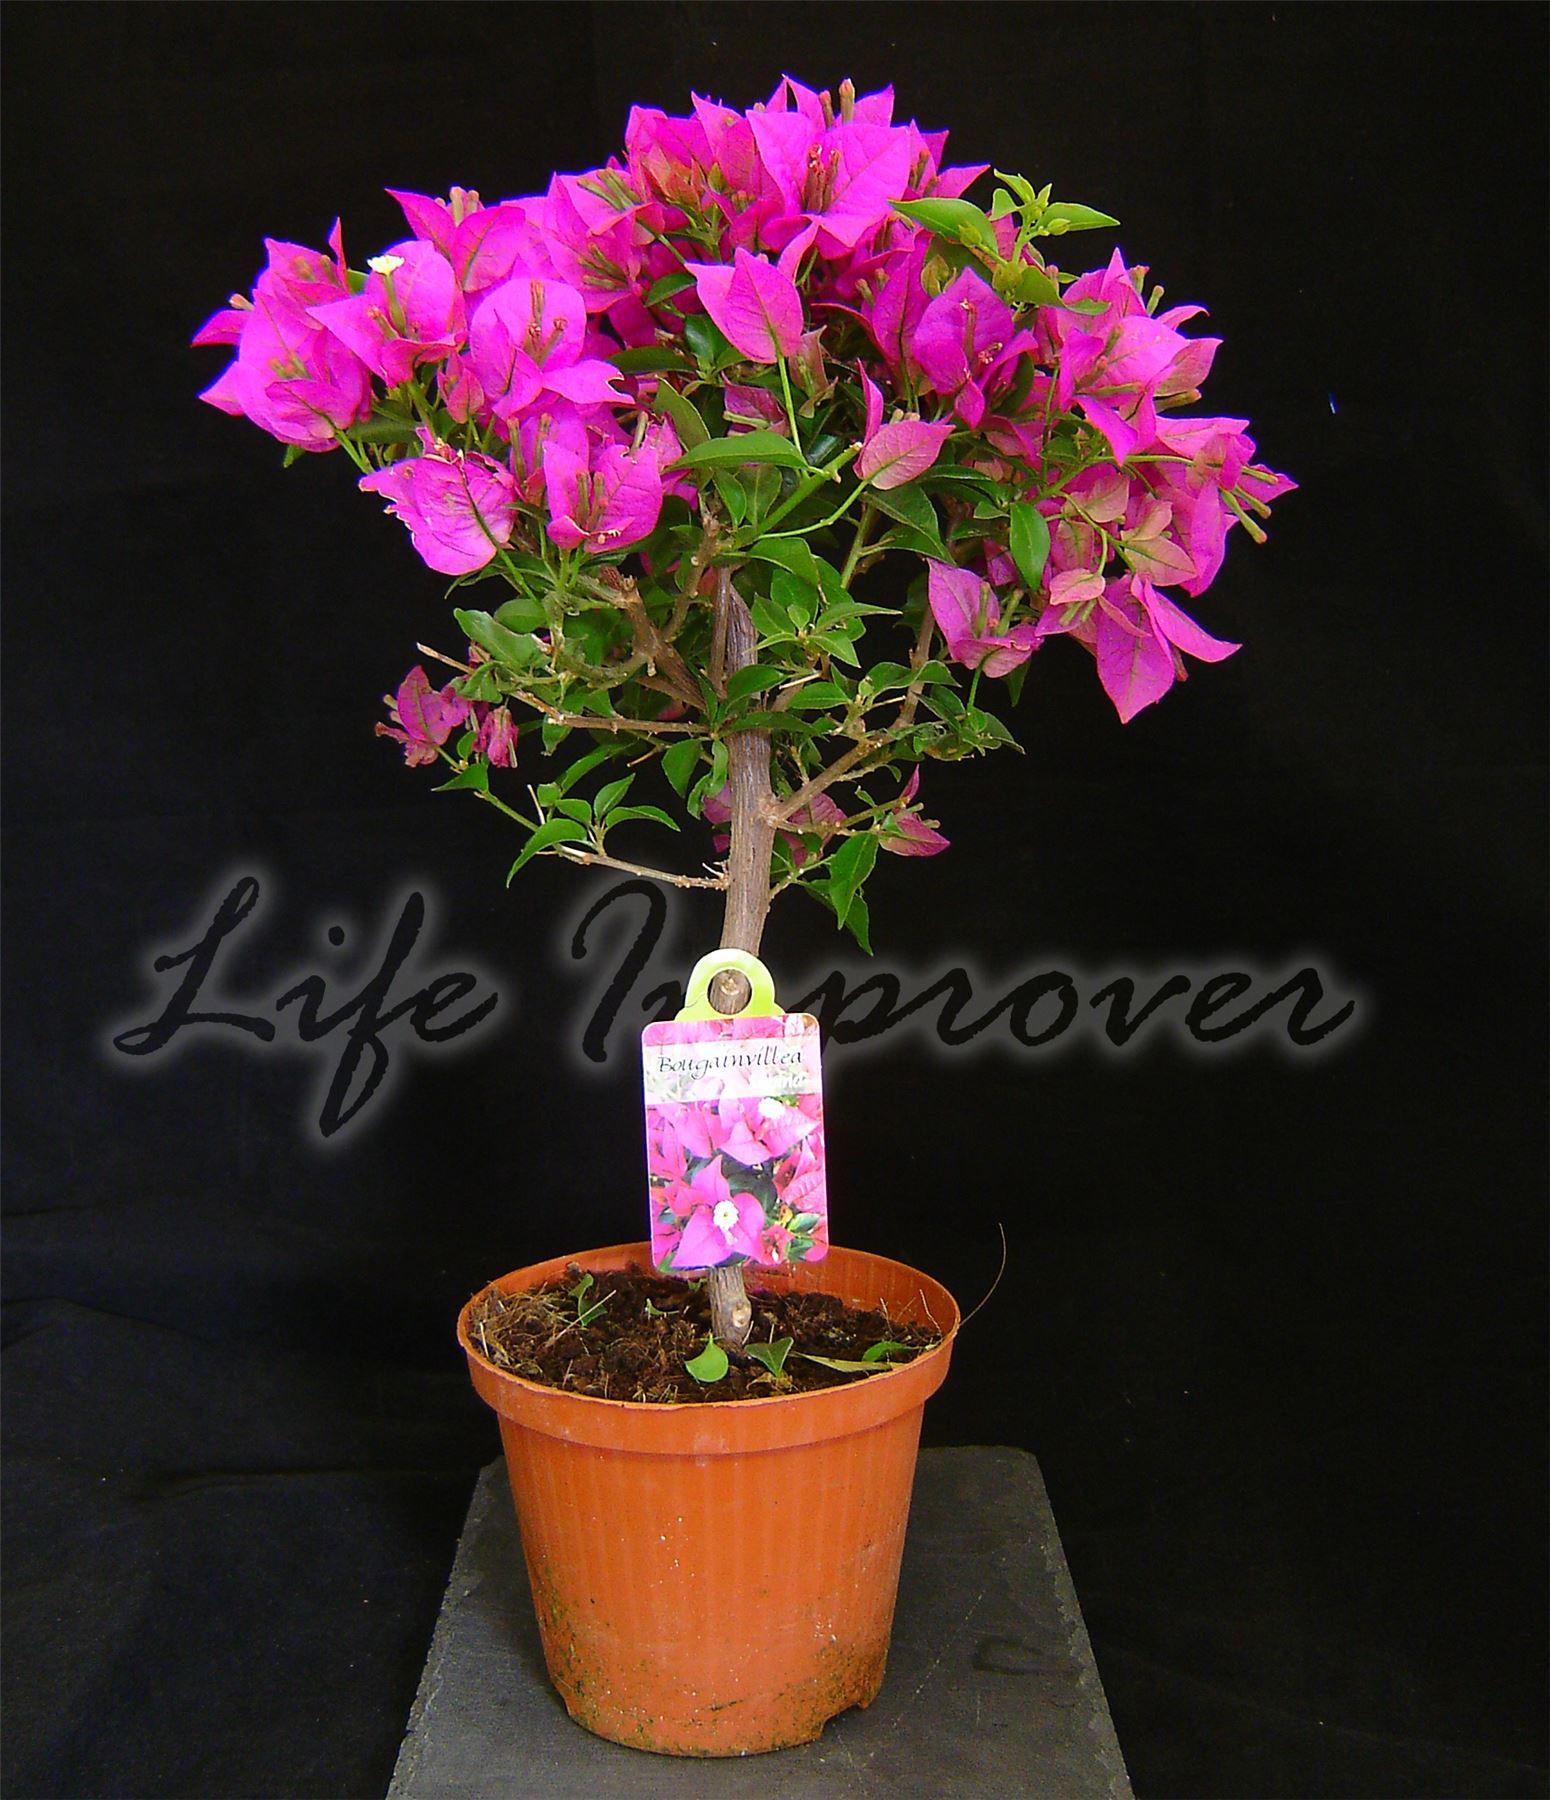 Bougainvillea purple flower hoop tree in pot climbing garden plant 60cm ebay - Best compost for flower pots solutions within reach ...